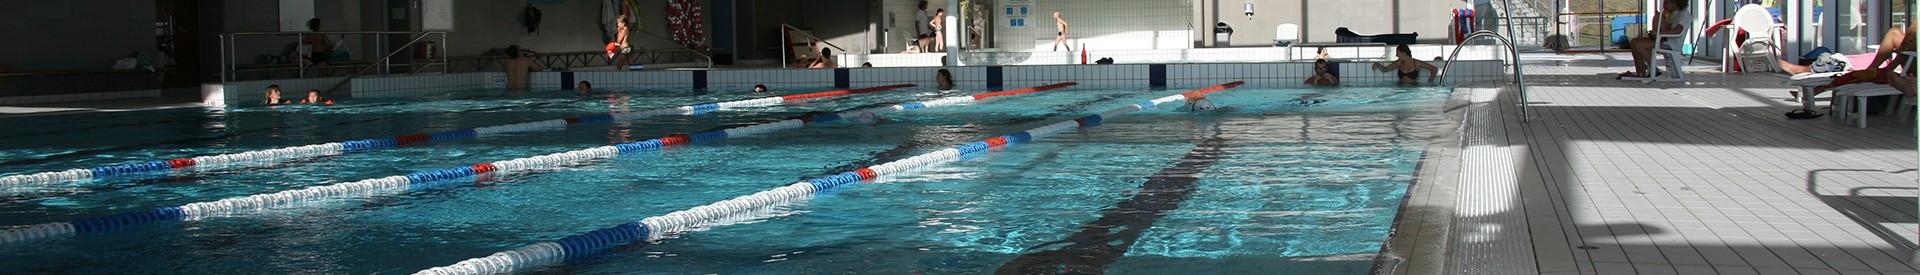 cours-natation-aquajade-piscine-st-brevin-sud-estuaire-254